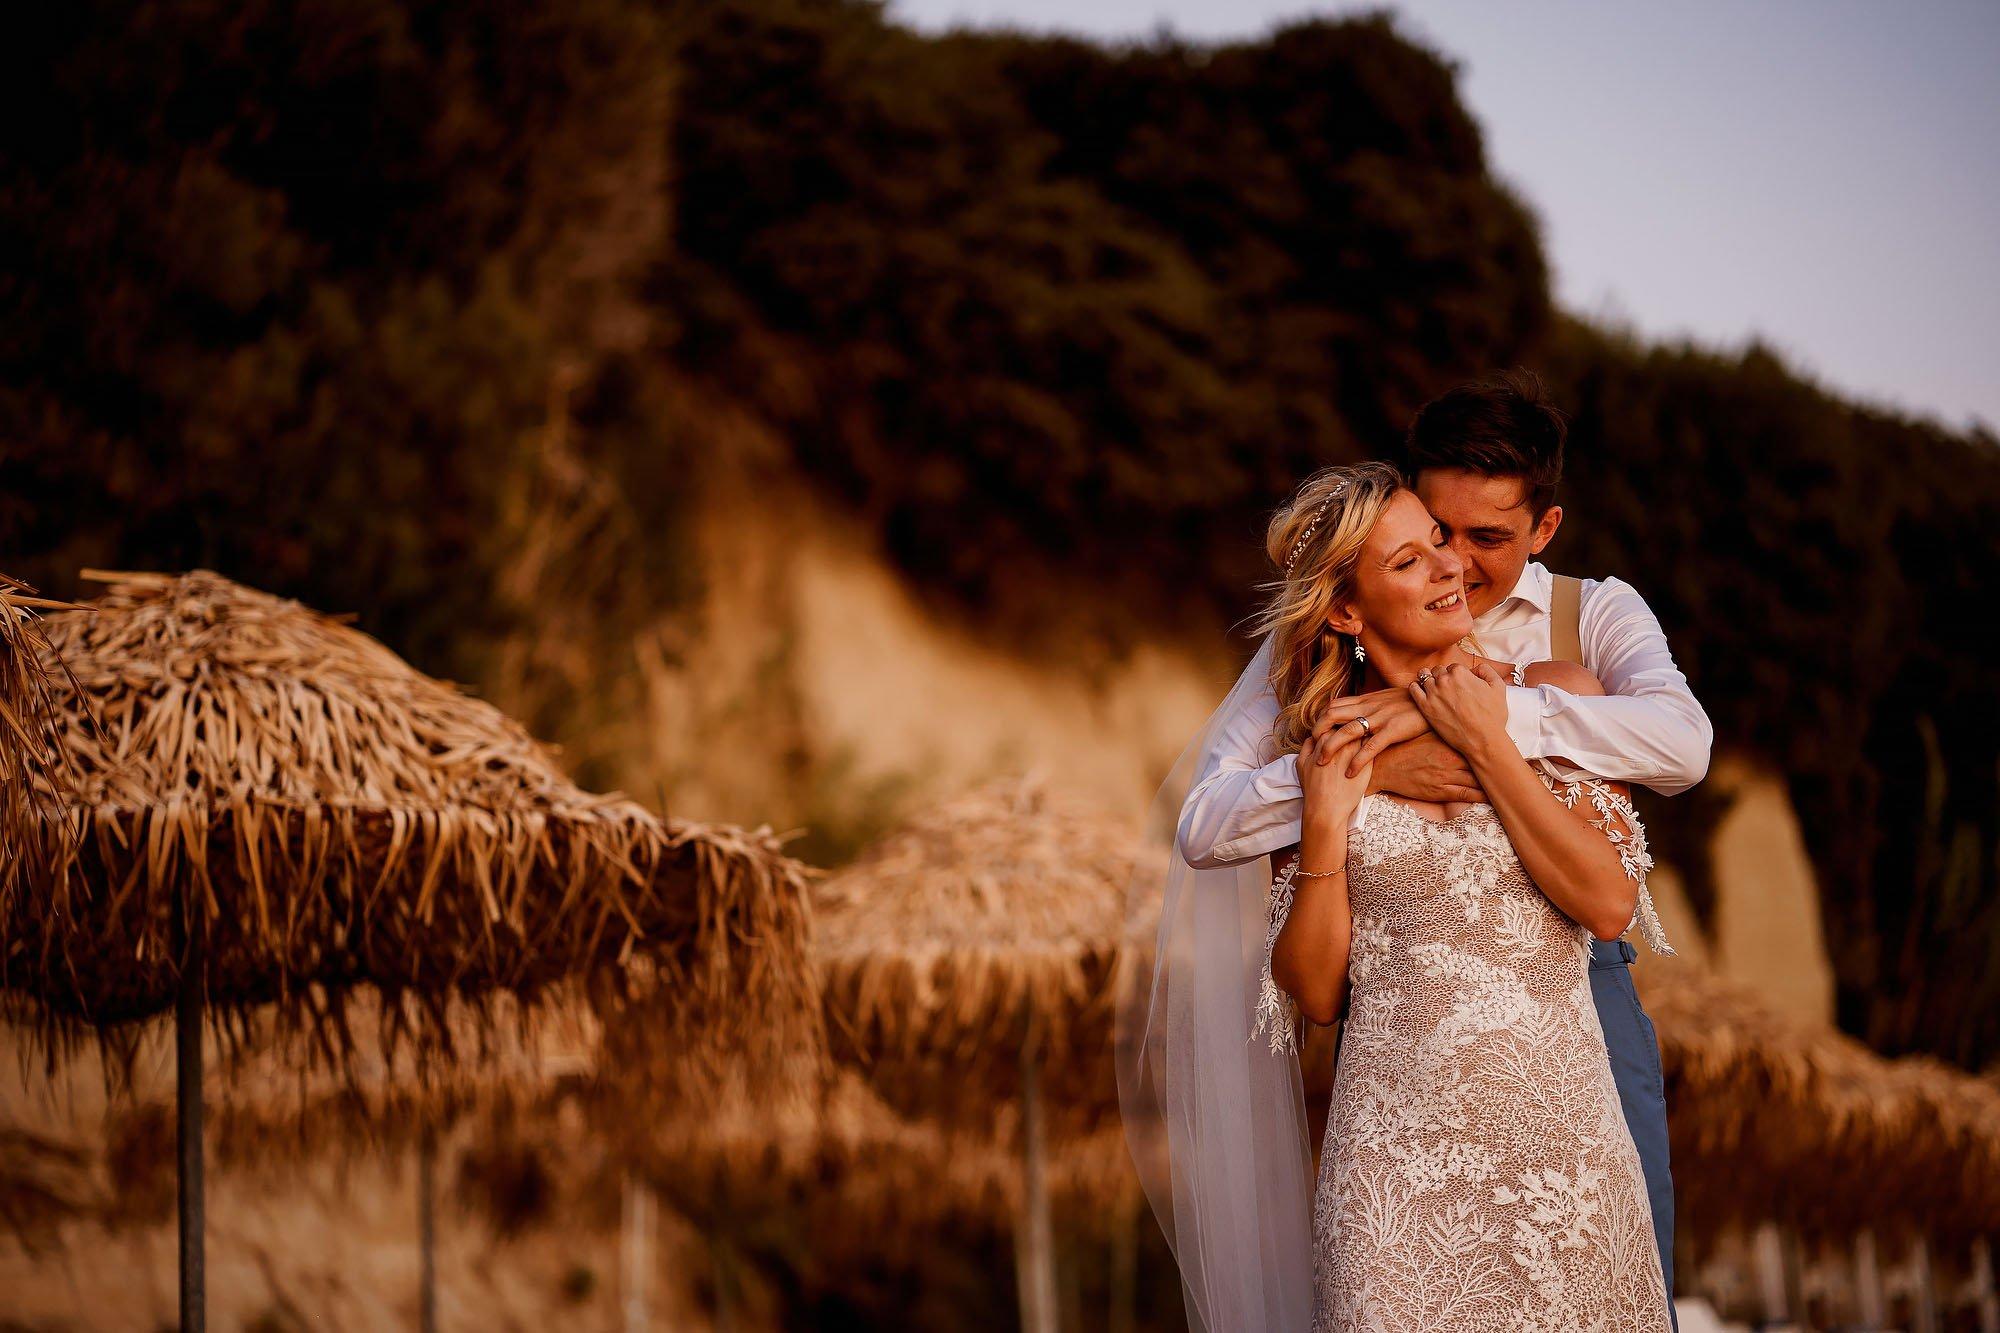 Pefkos rhodes greece destination wedding at philosophia - arj photography®